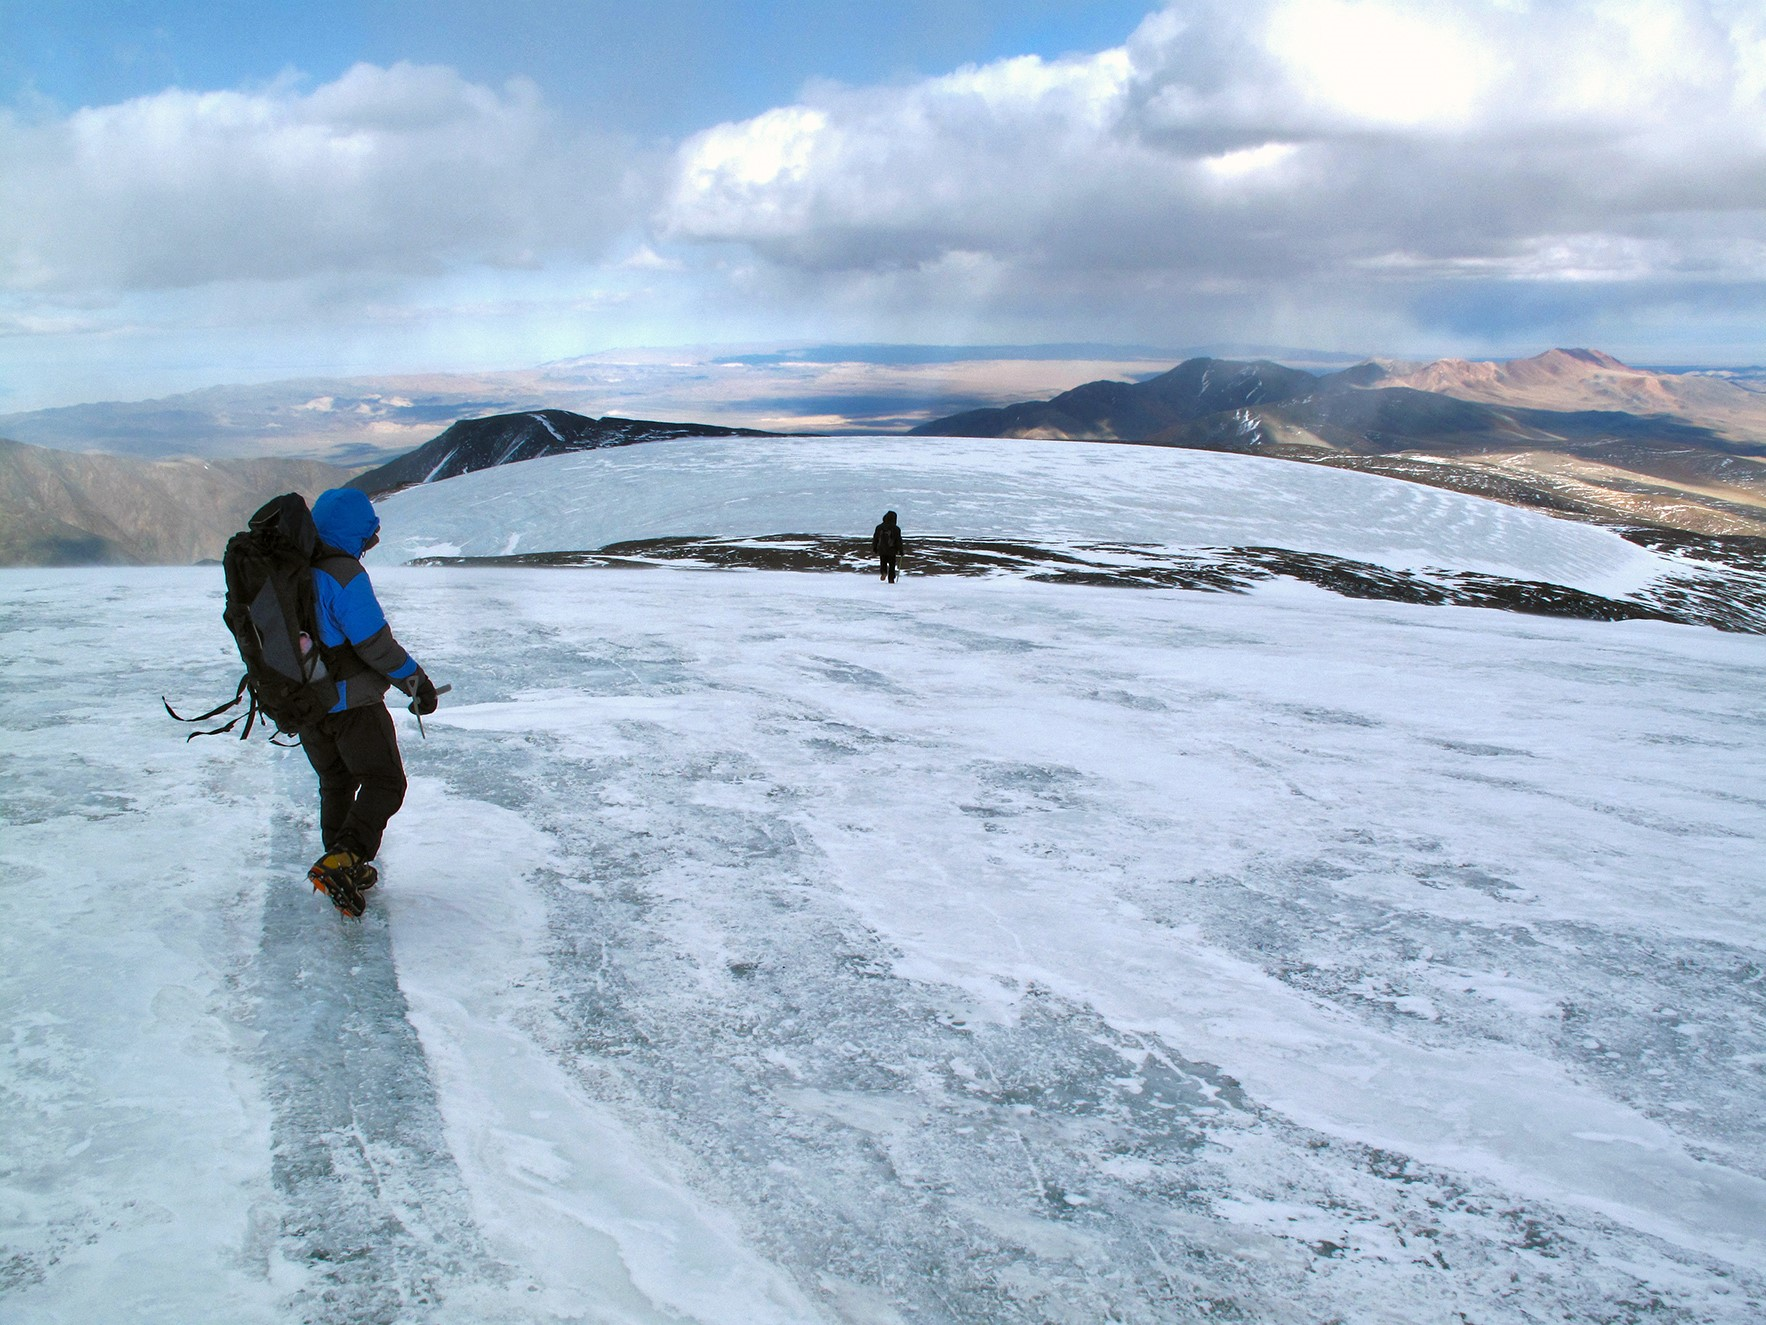 glaciers in mongolia s gobi desert actually shrank during the last